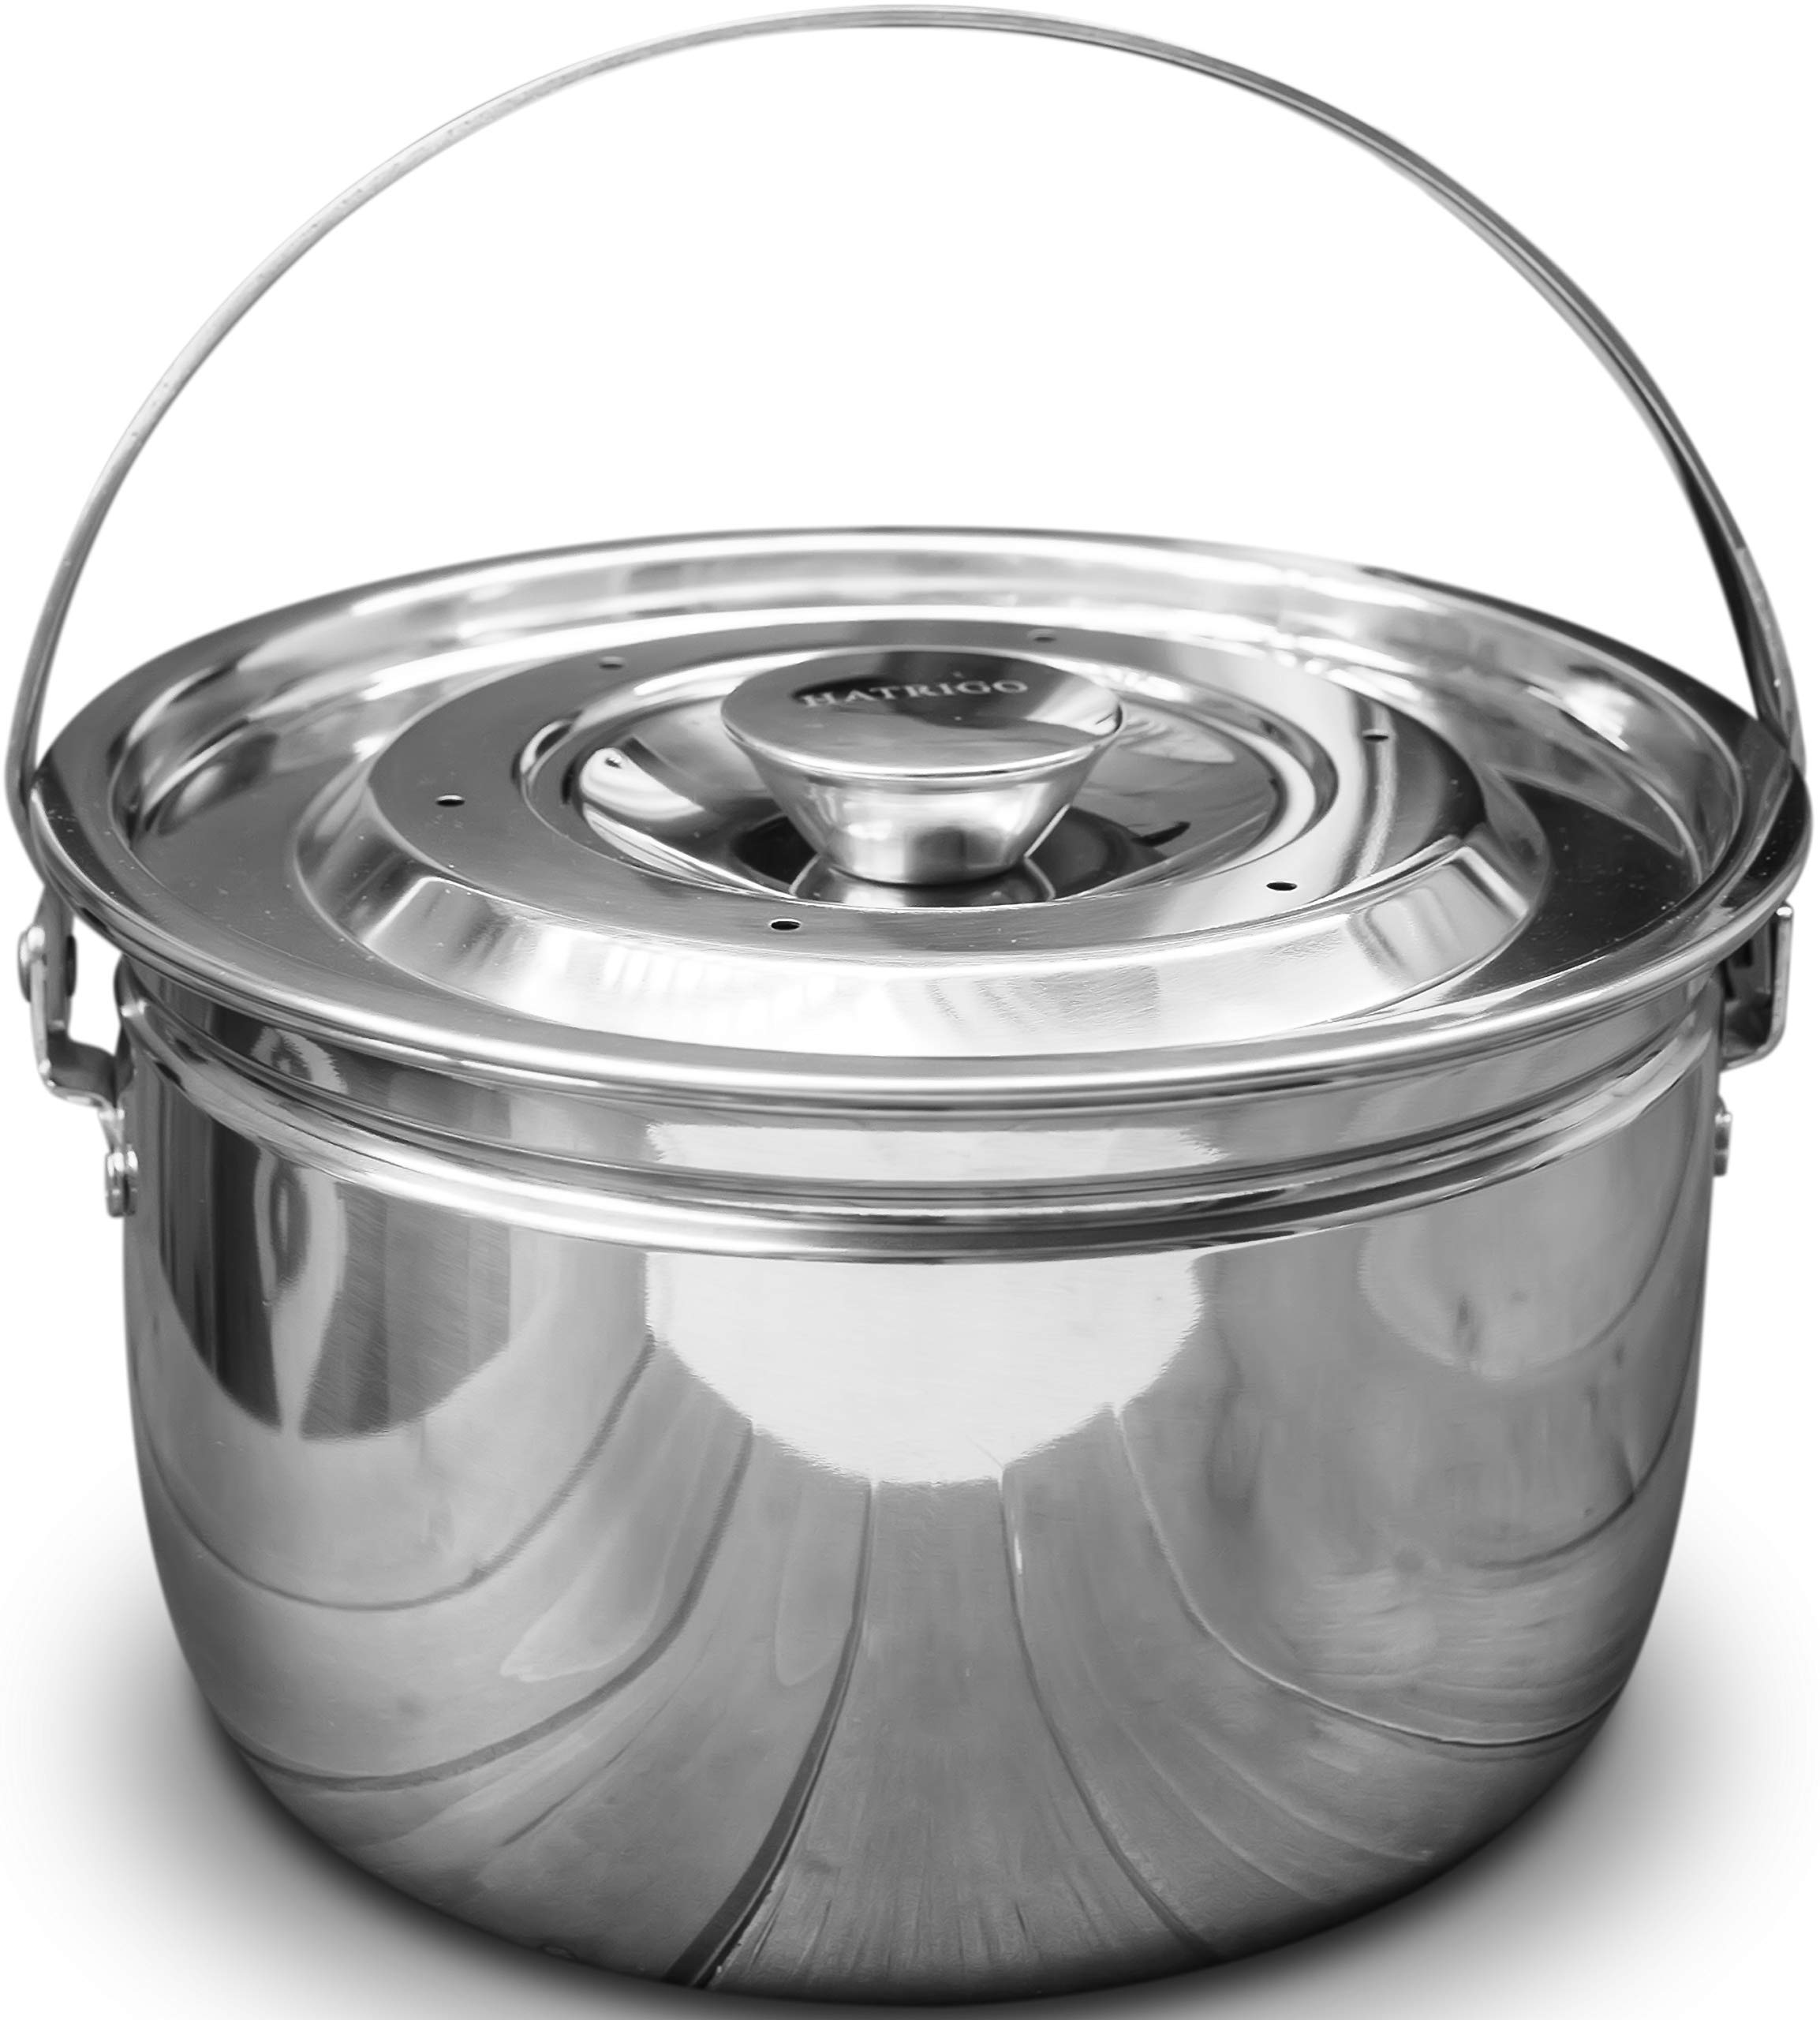 Hatrigo Multi-Purpose Deep Bowl Stackable Steamer Insert Pans for Pot in Pot with Handle Lid, PIP Compatible with Instant Pot Accessories Ninja Foodi 6 qt 8 qt Air Fryer Accessories for Sauce Yogurt